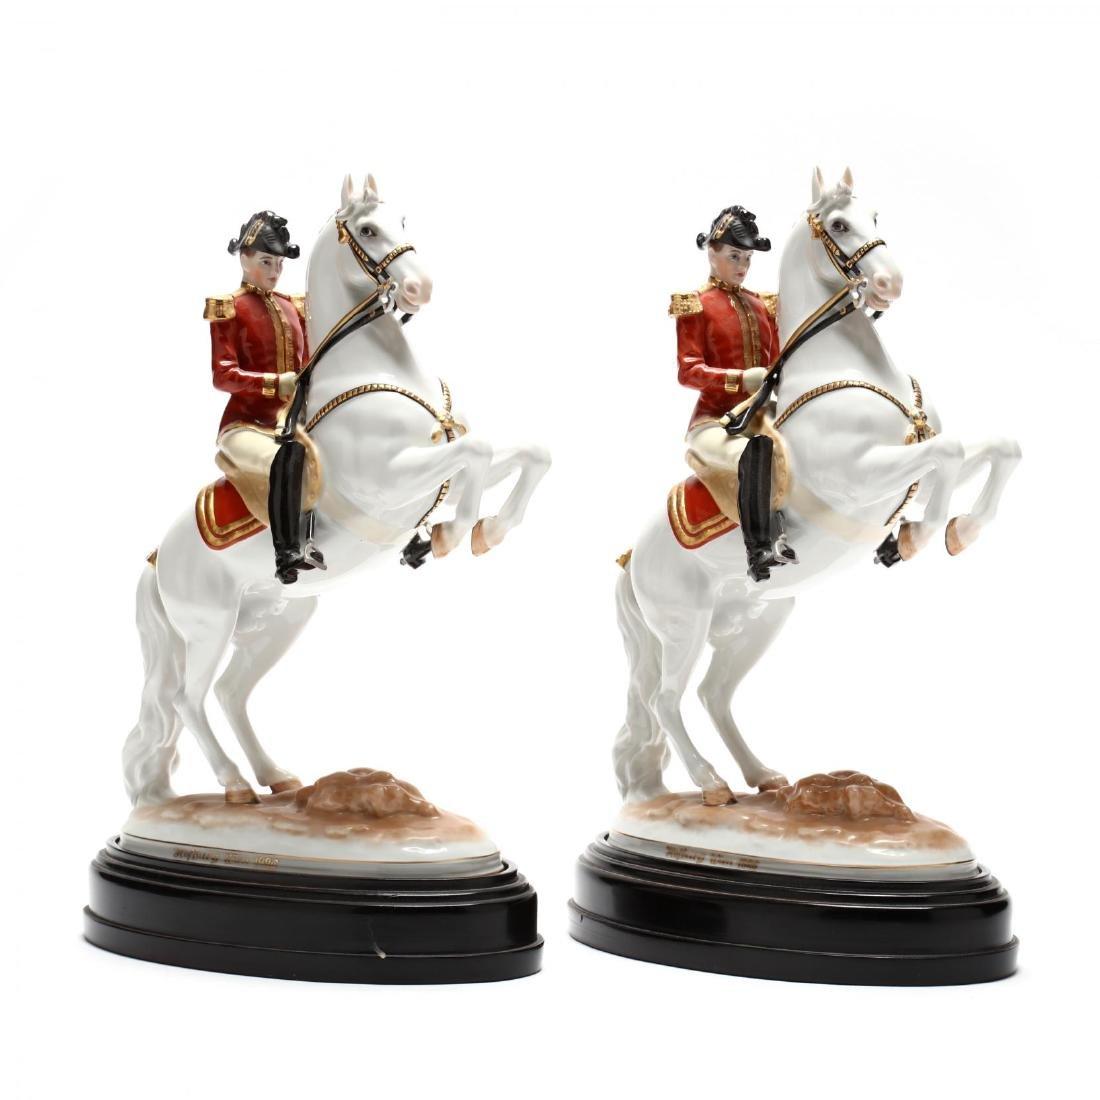 A Pair of Hofburg Wien, Augarten, Spanish Riding School